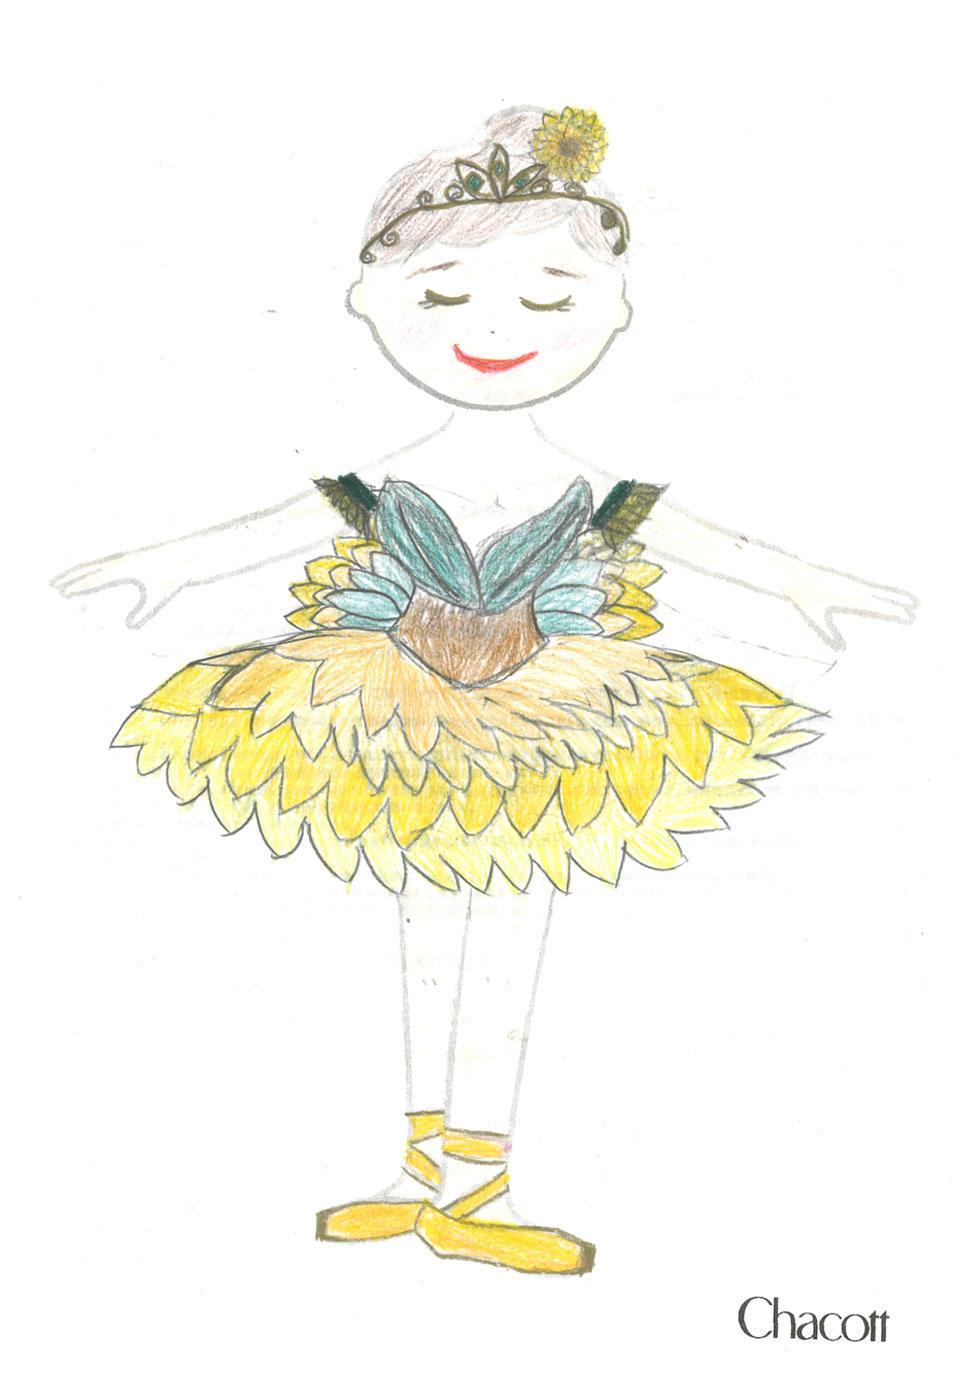 fukuoka_costume_design_2020_0010.jpg